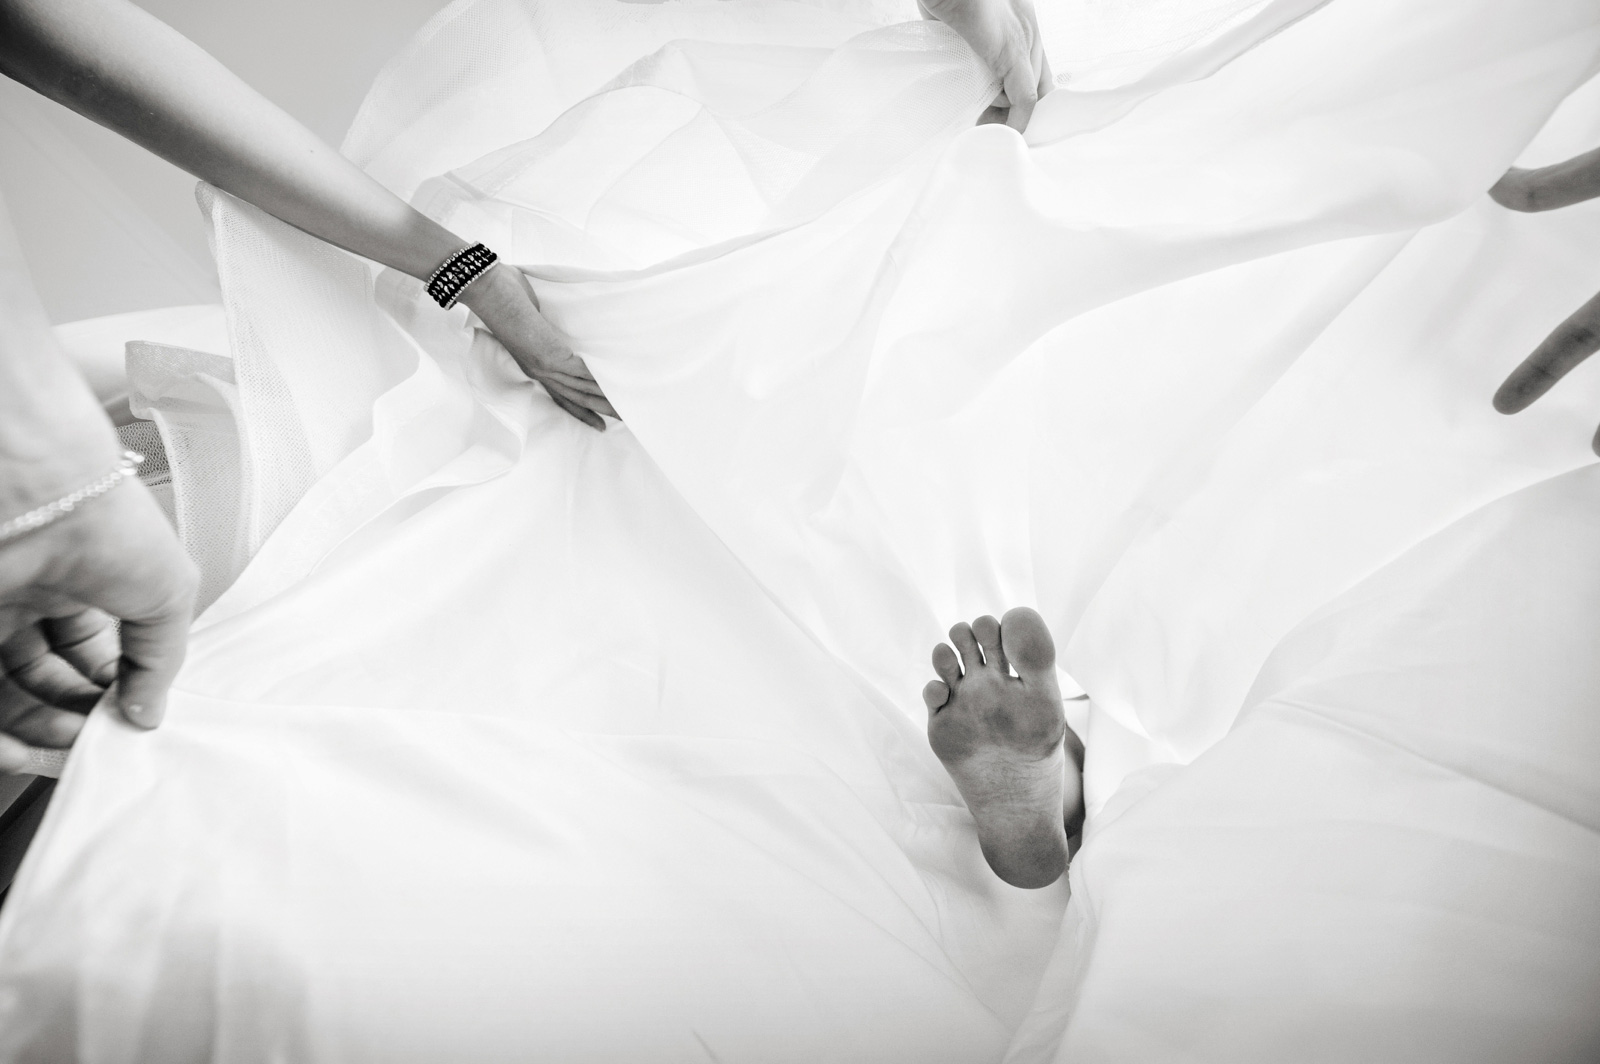 brides foot in dress